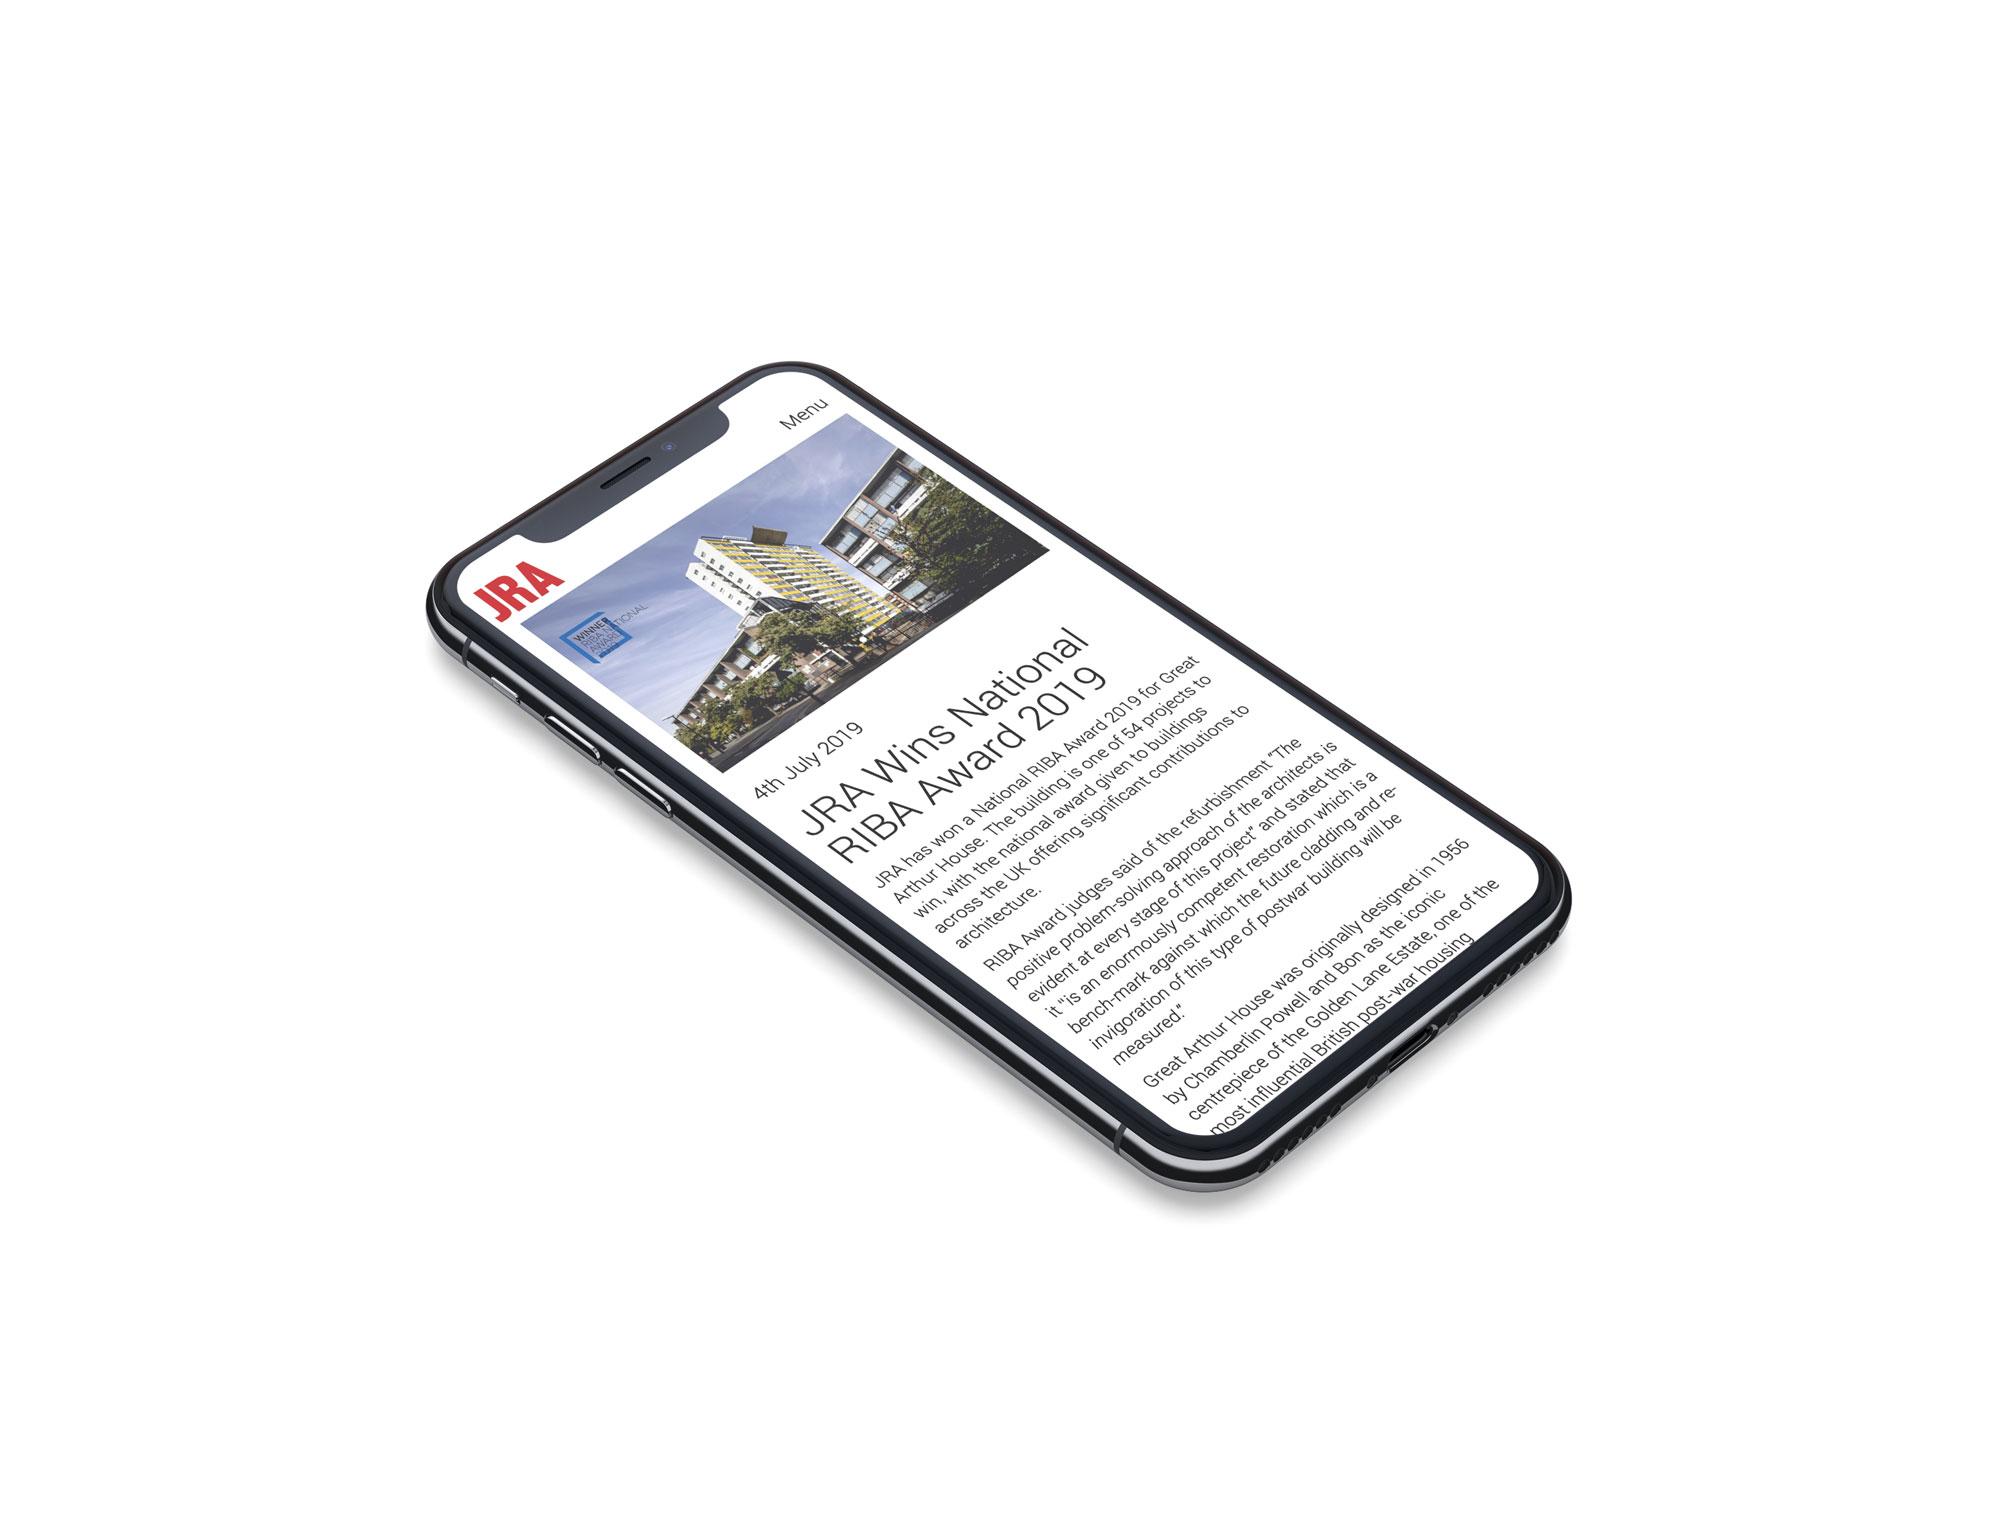 jra iphone mockup property website